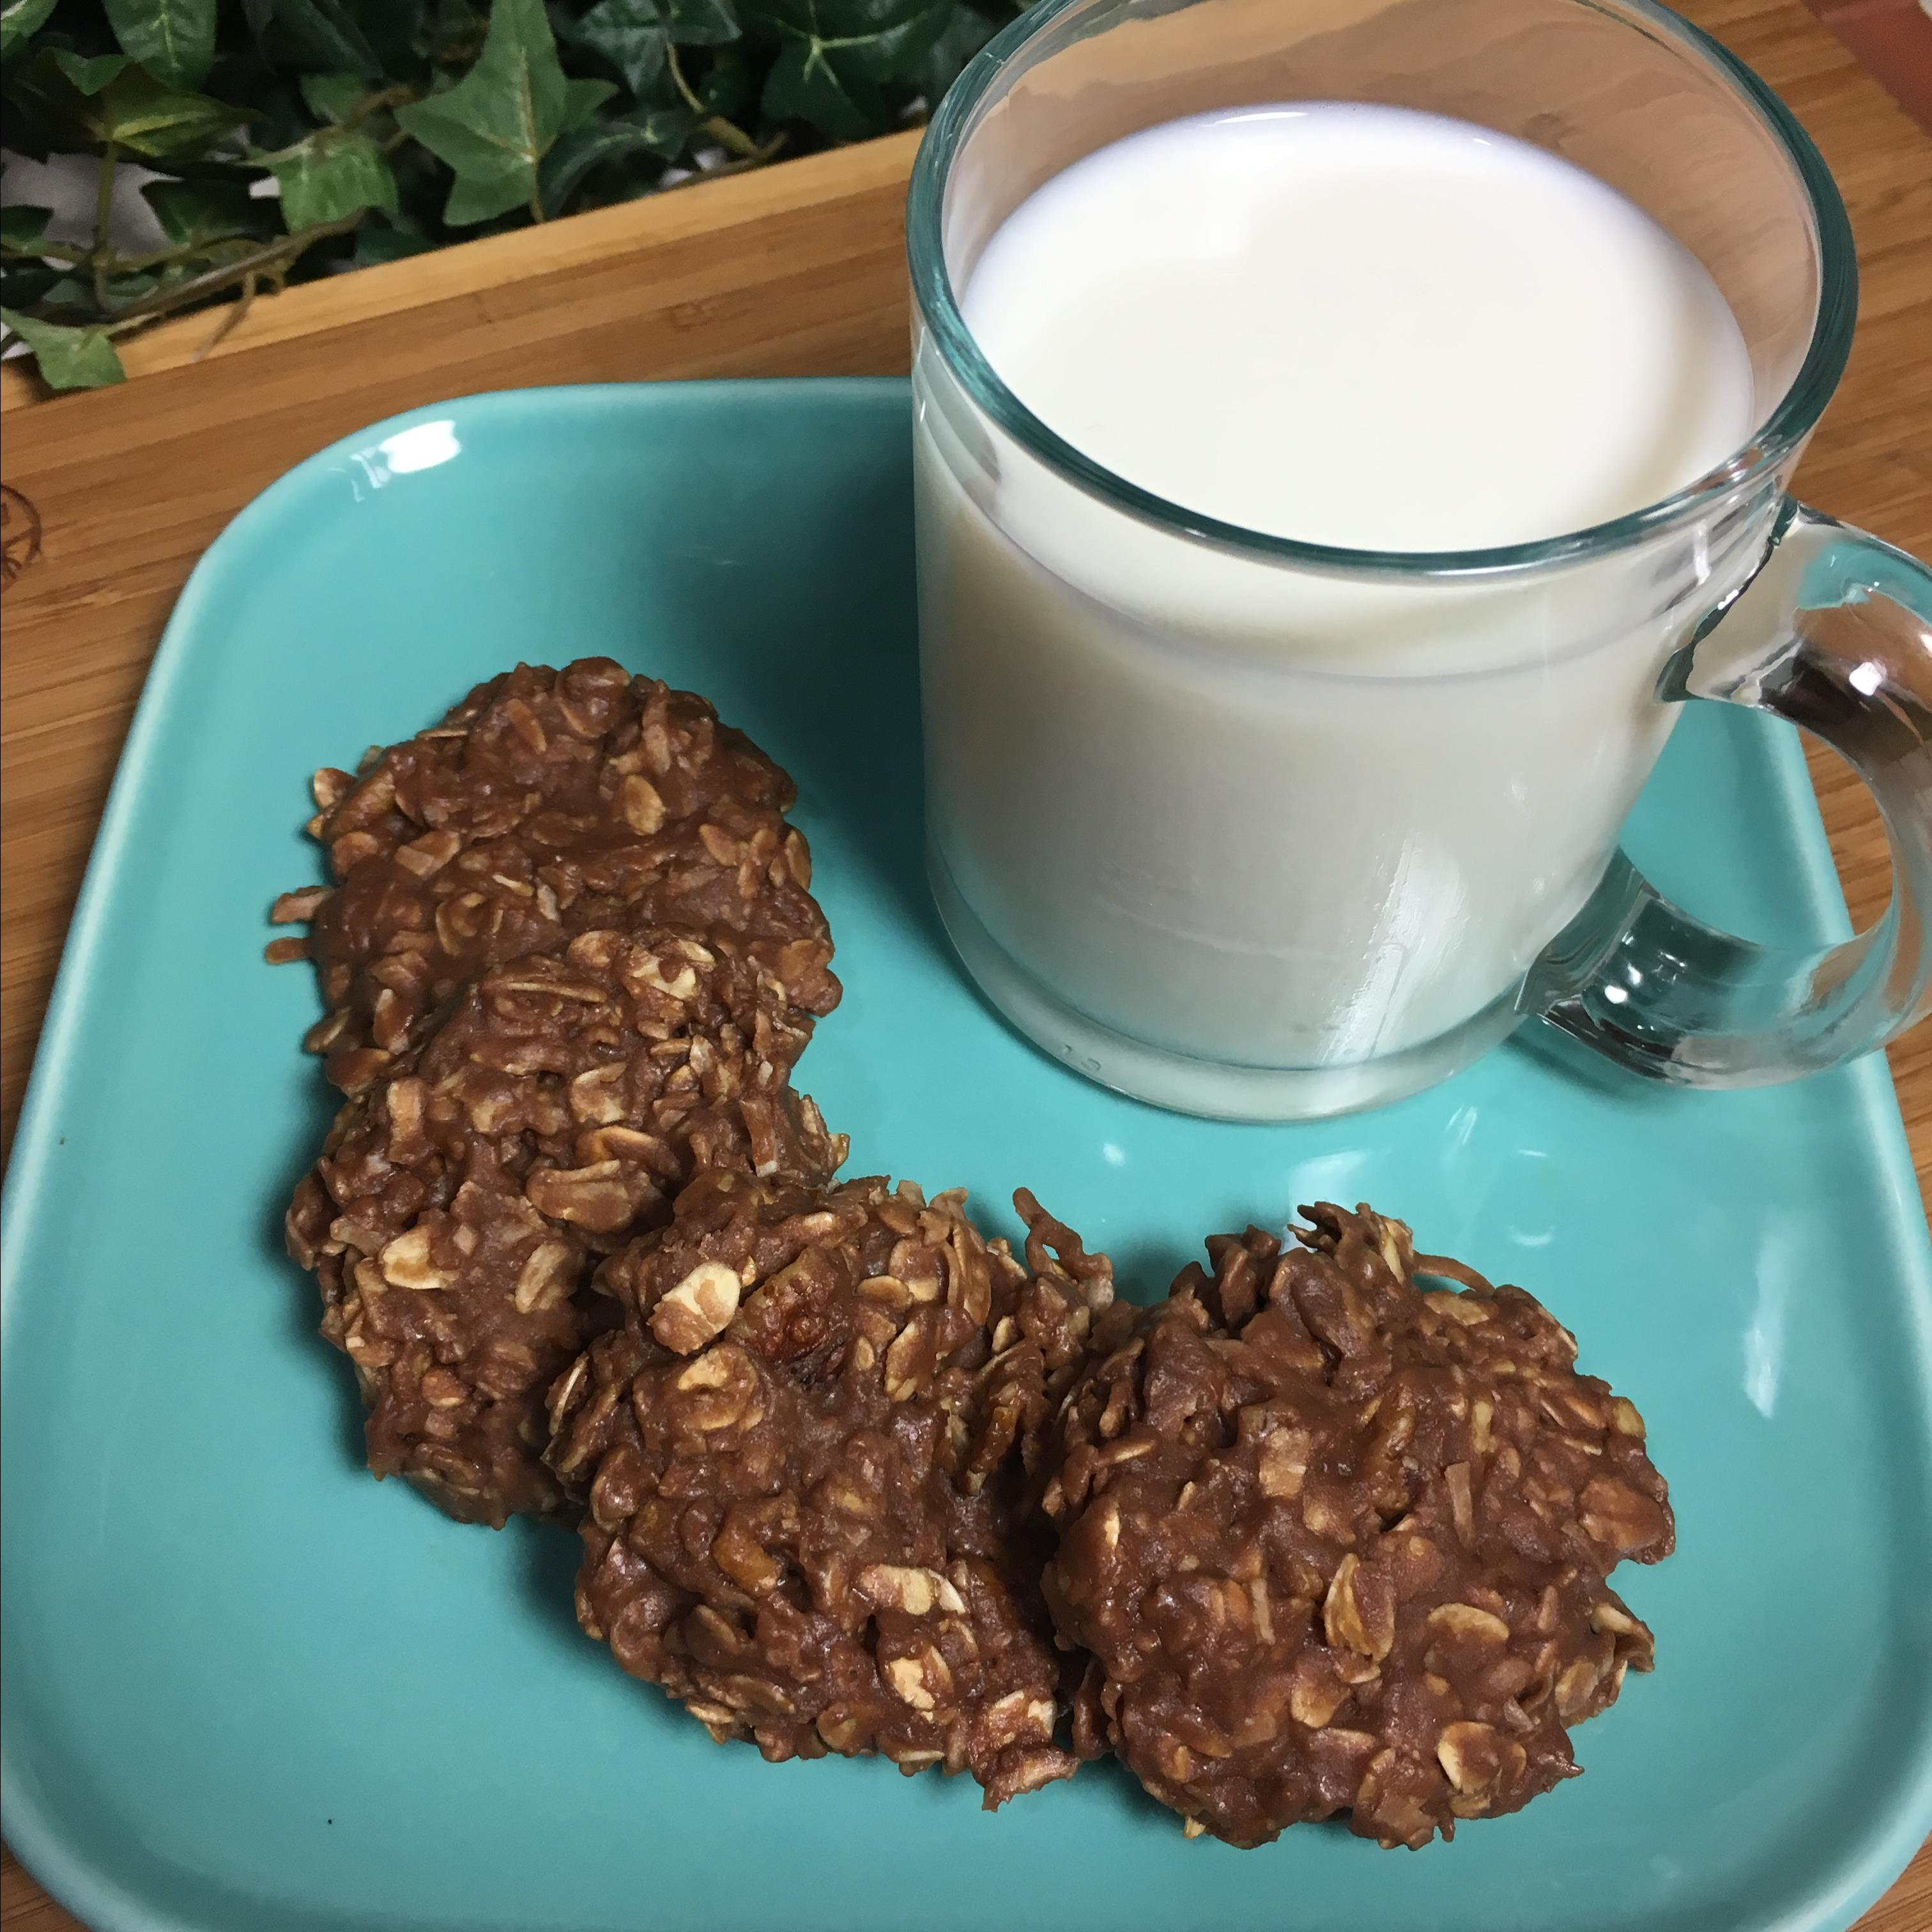 Grandma's Refrigerator Cookies JUDYCAROL3